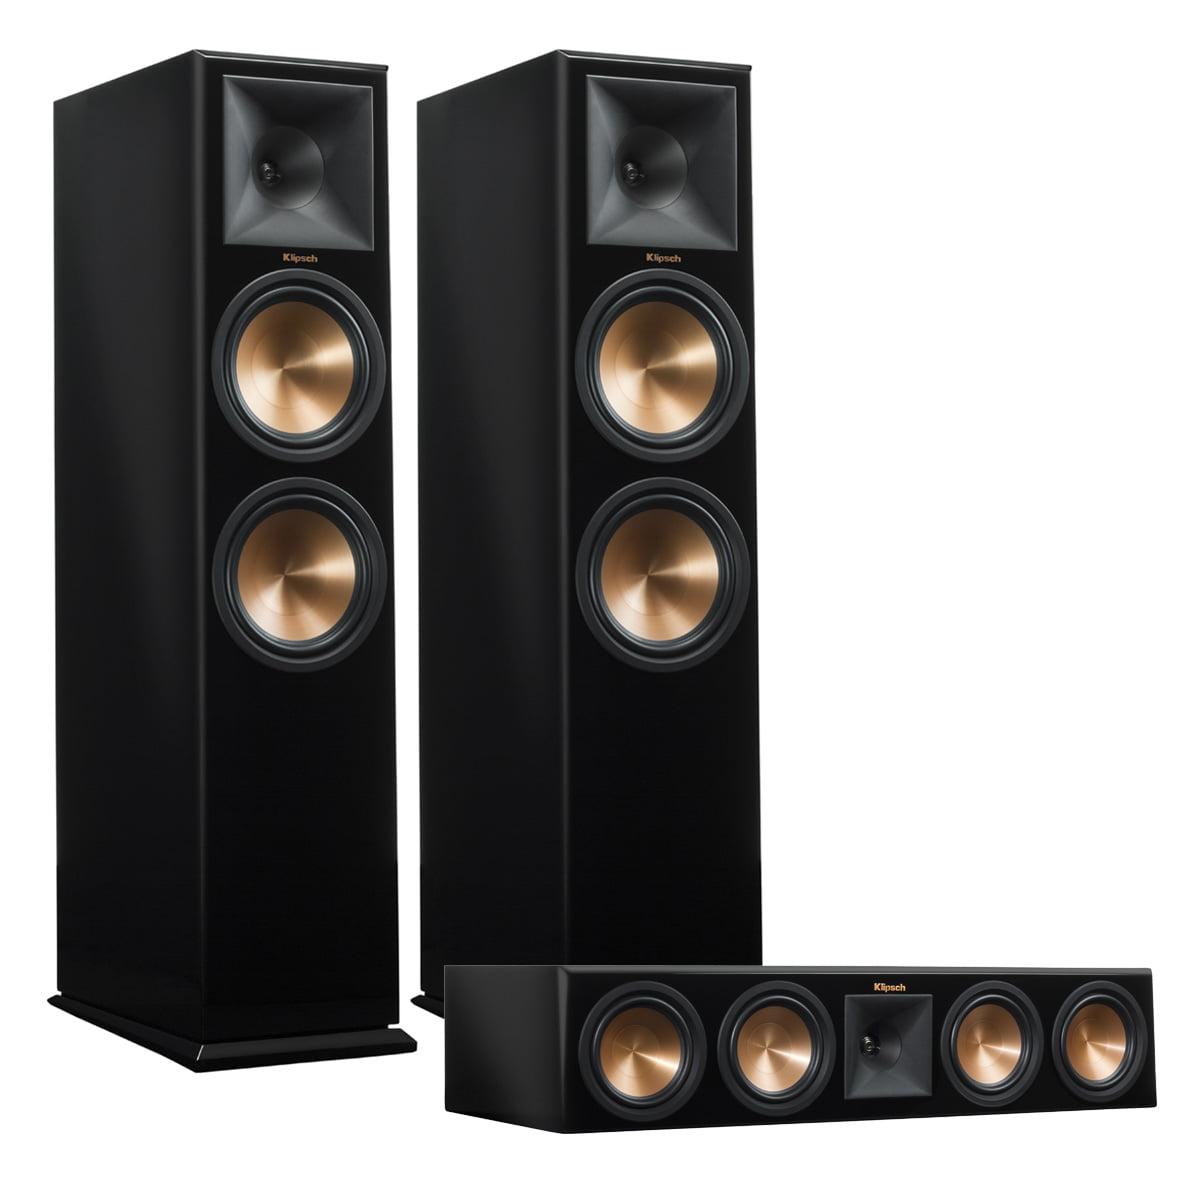 Klipsch RP-280F Reference Premiere Floorstanding Speaker Pair with RP-450C Center Channel Speaker (Piano Black) by Klipsch